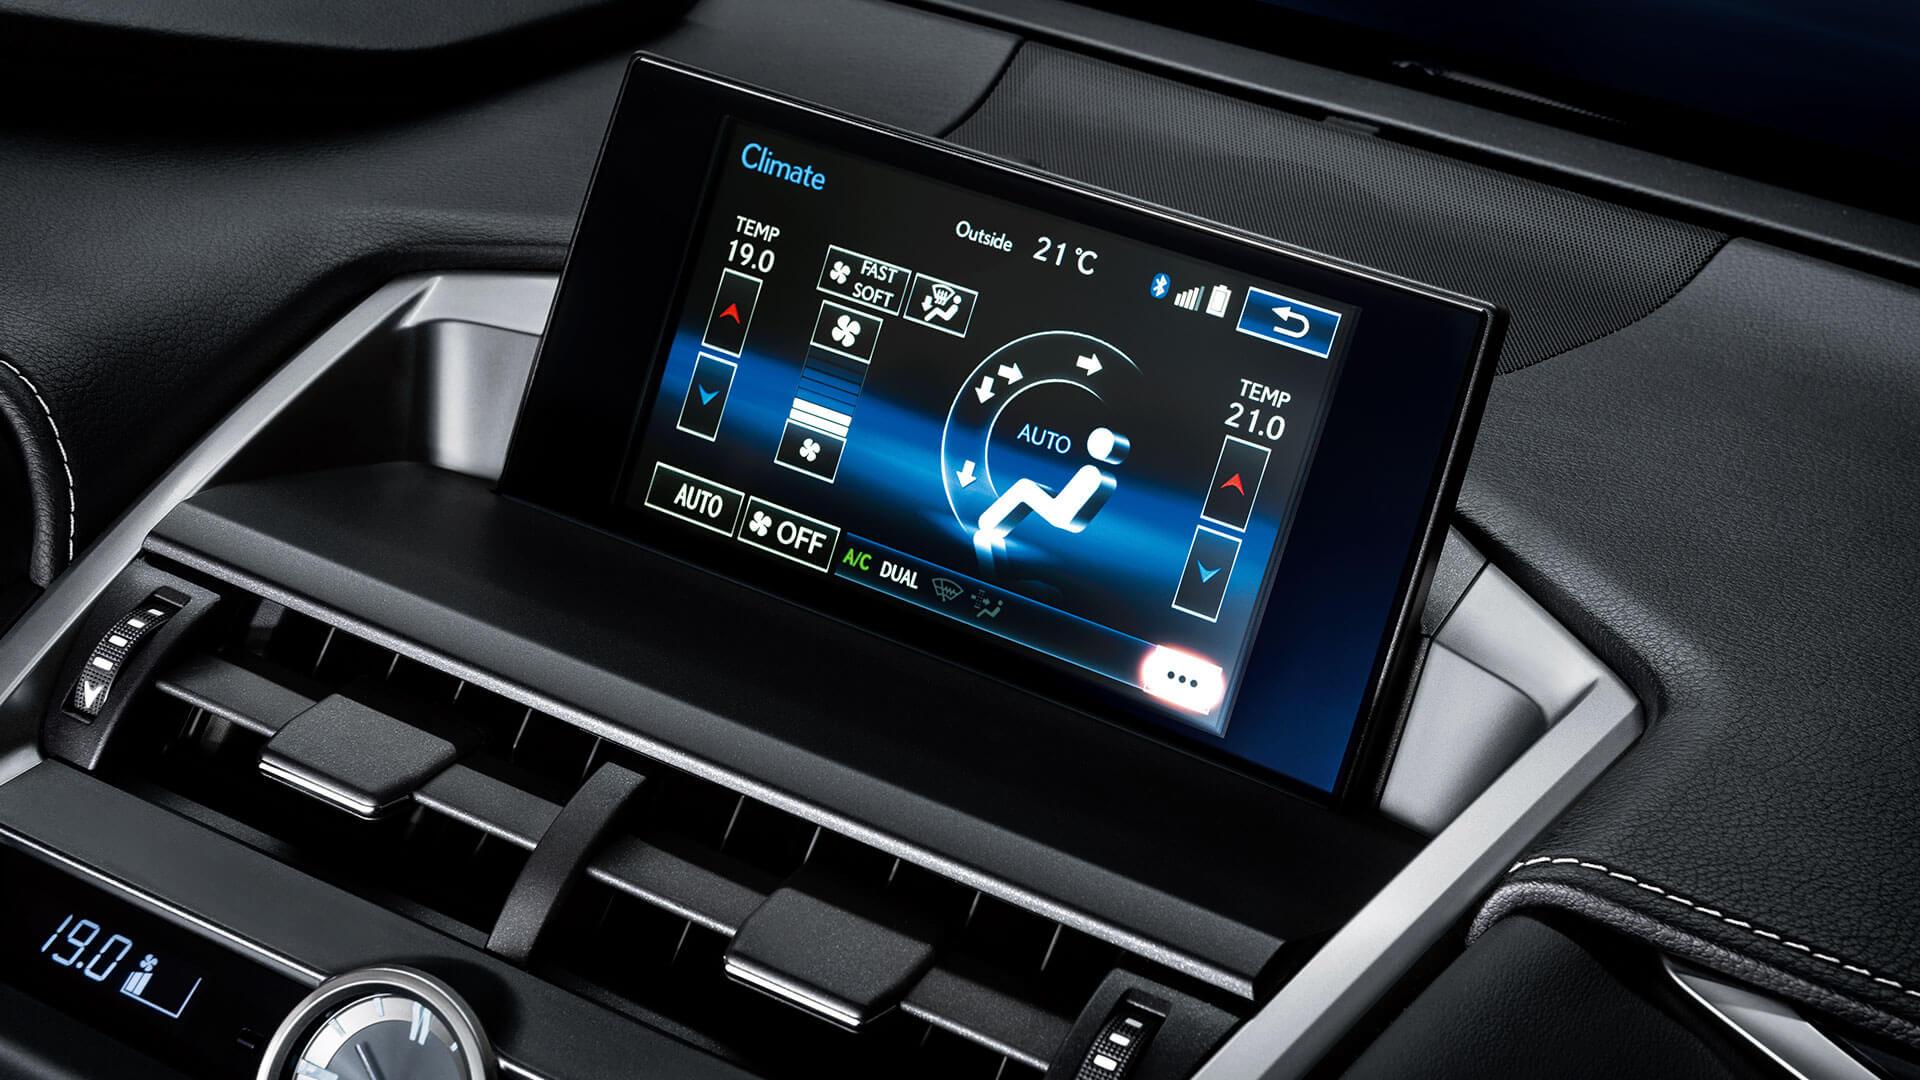 2017 lexus nx 200t features climate control